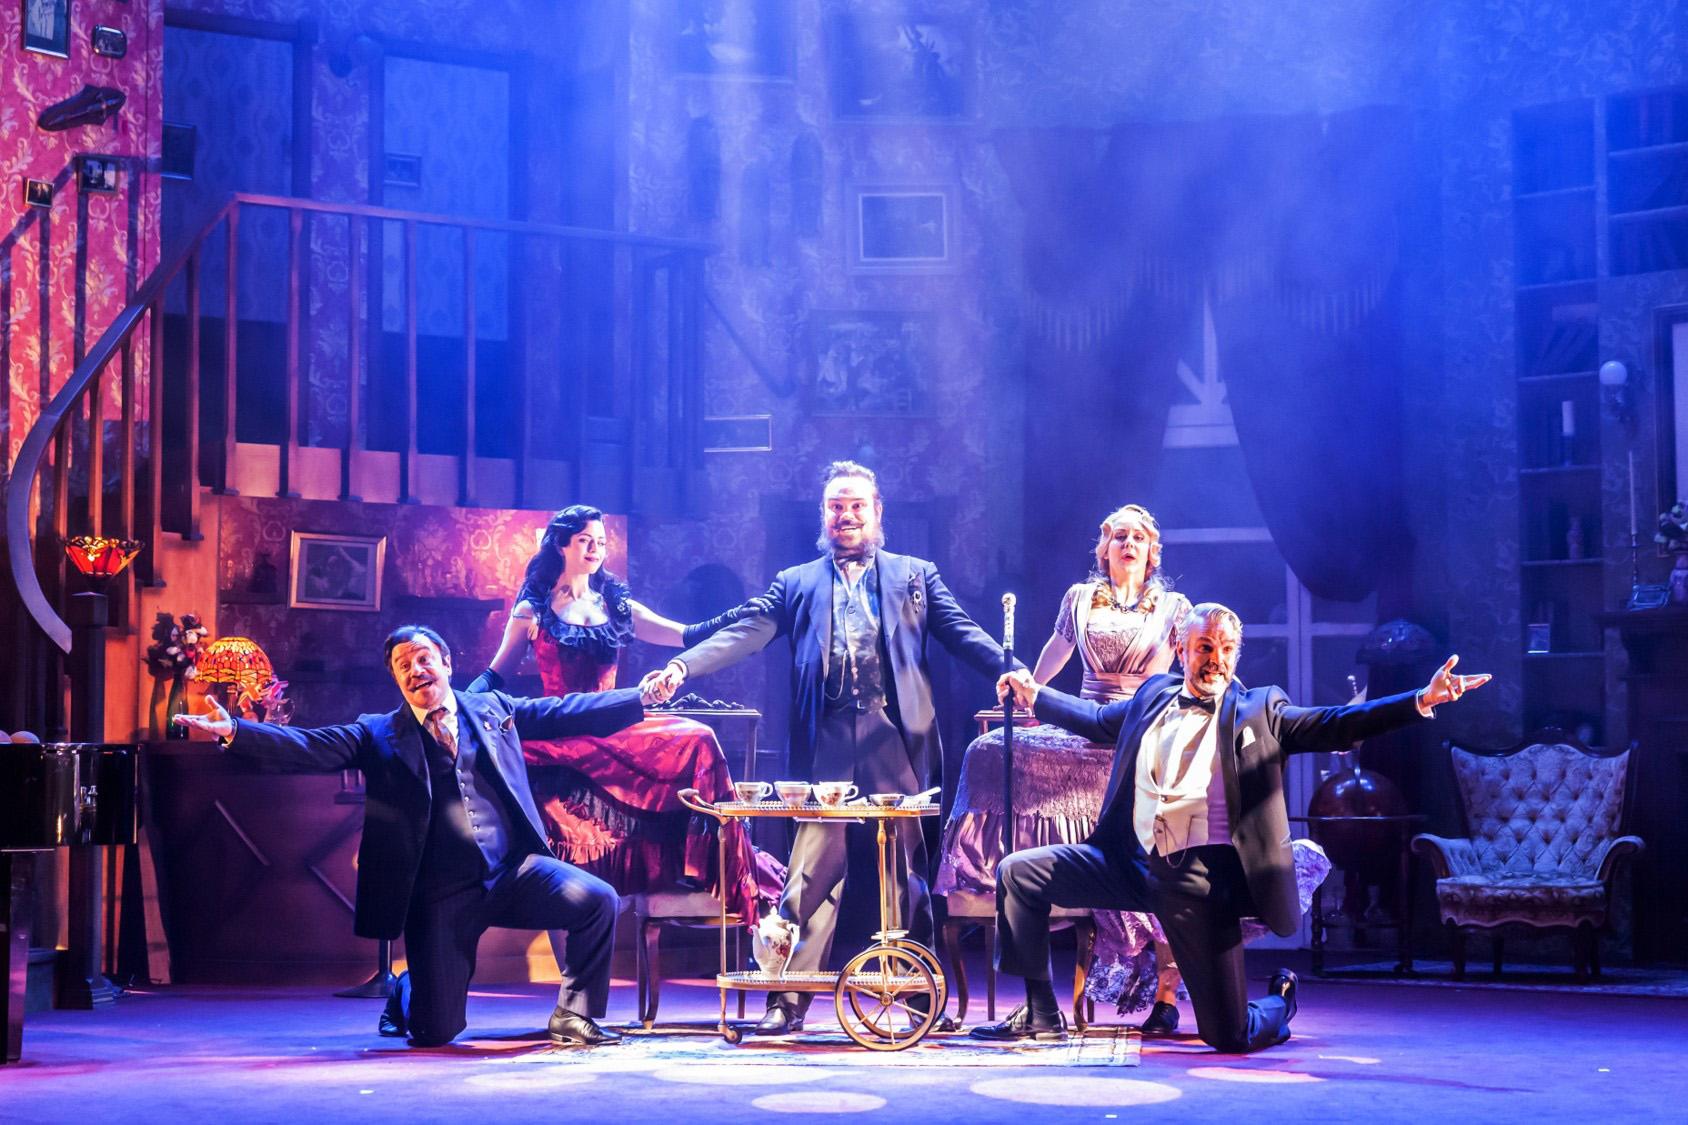 teatre apolo, grupo smedia, teatro musical, daniel diges